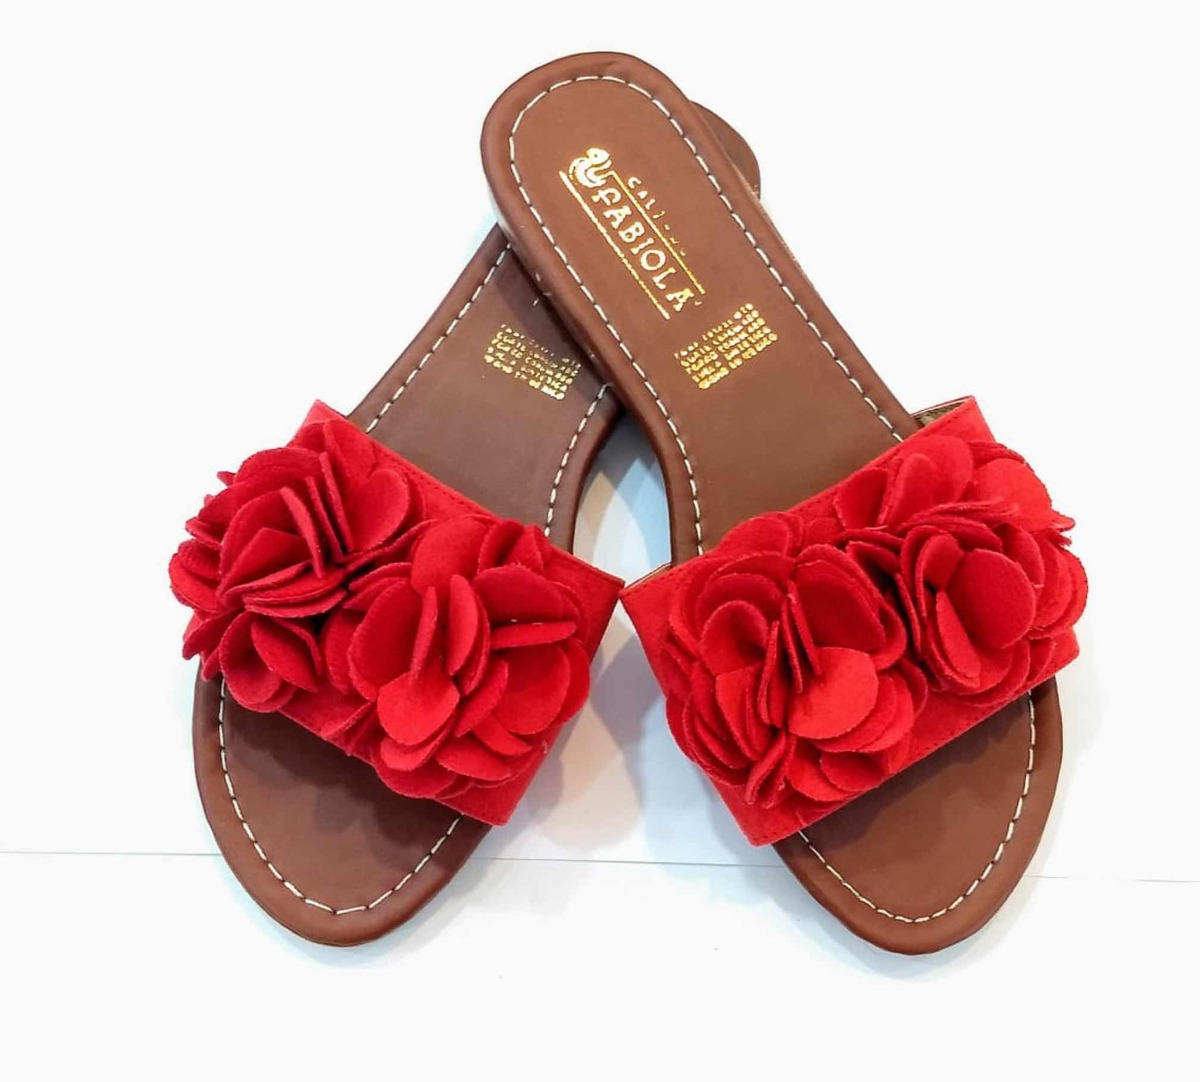 Moda Dama Casual Chancla Flores Coral Huara Planas Sandalias yY7gbf6